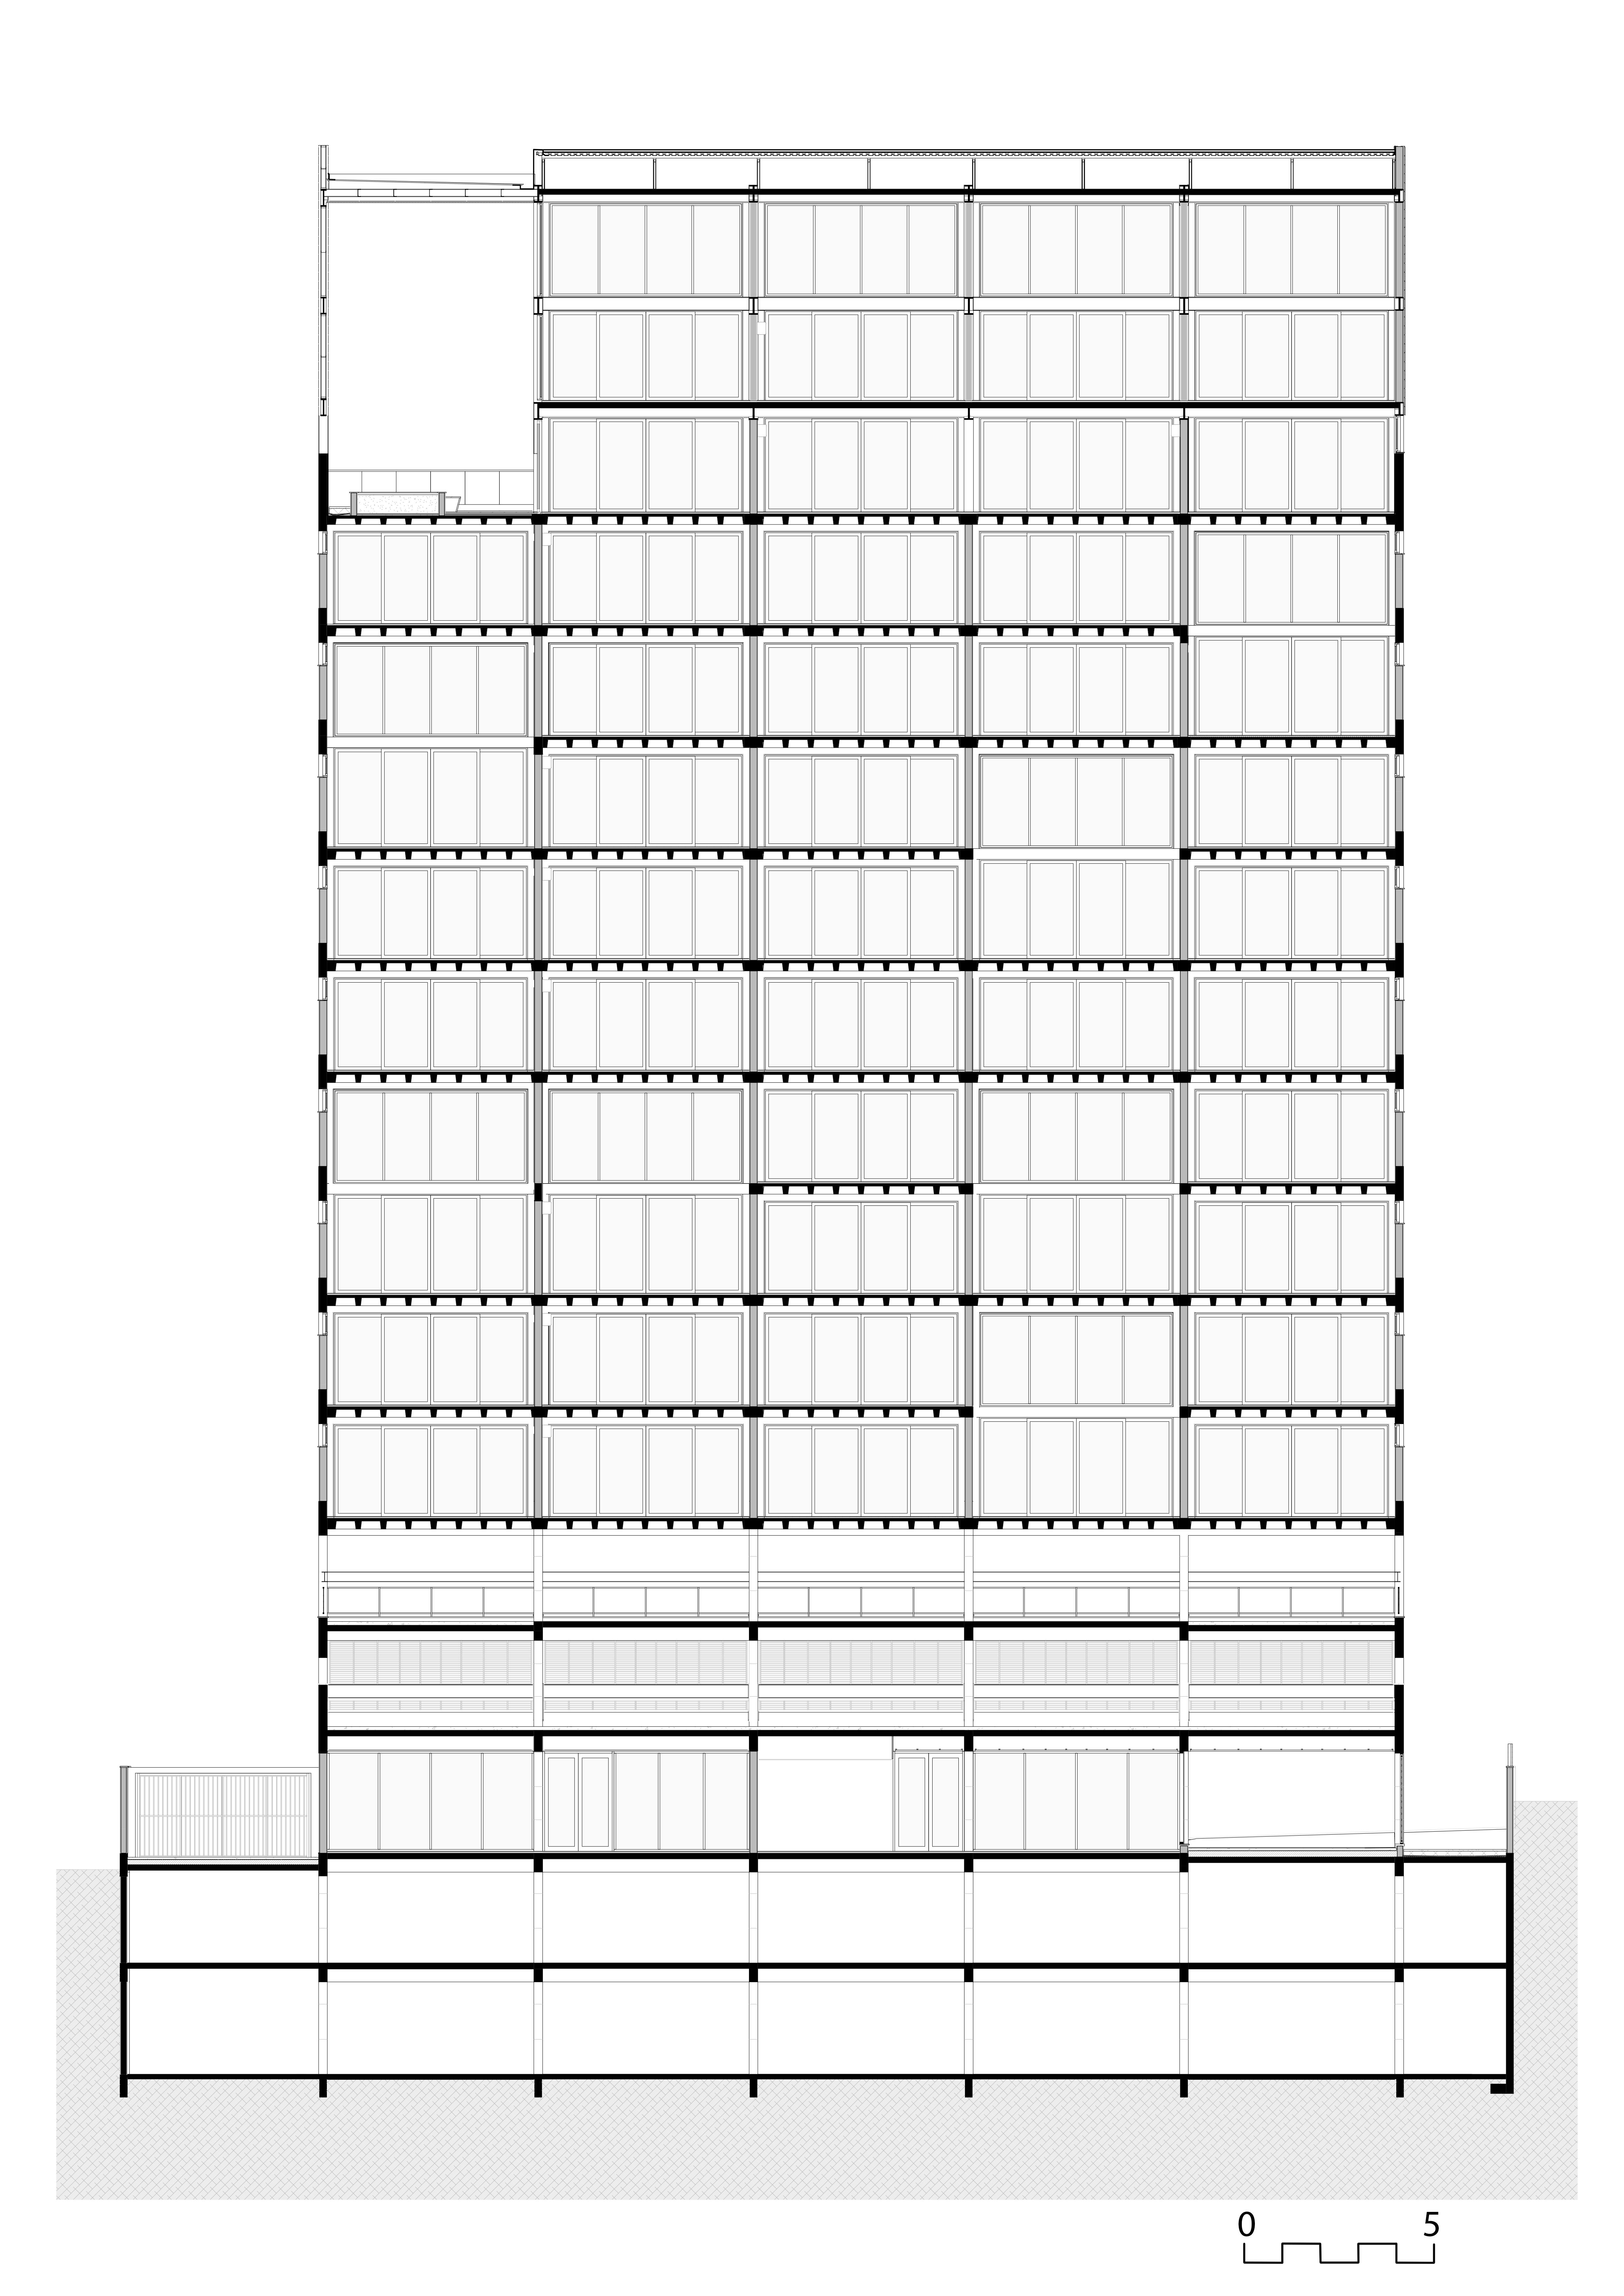 FISA VINT - Section